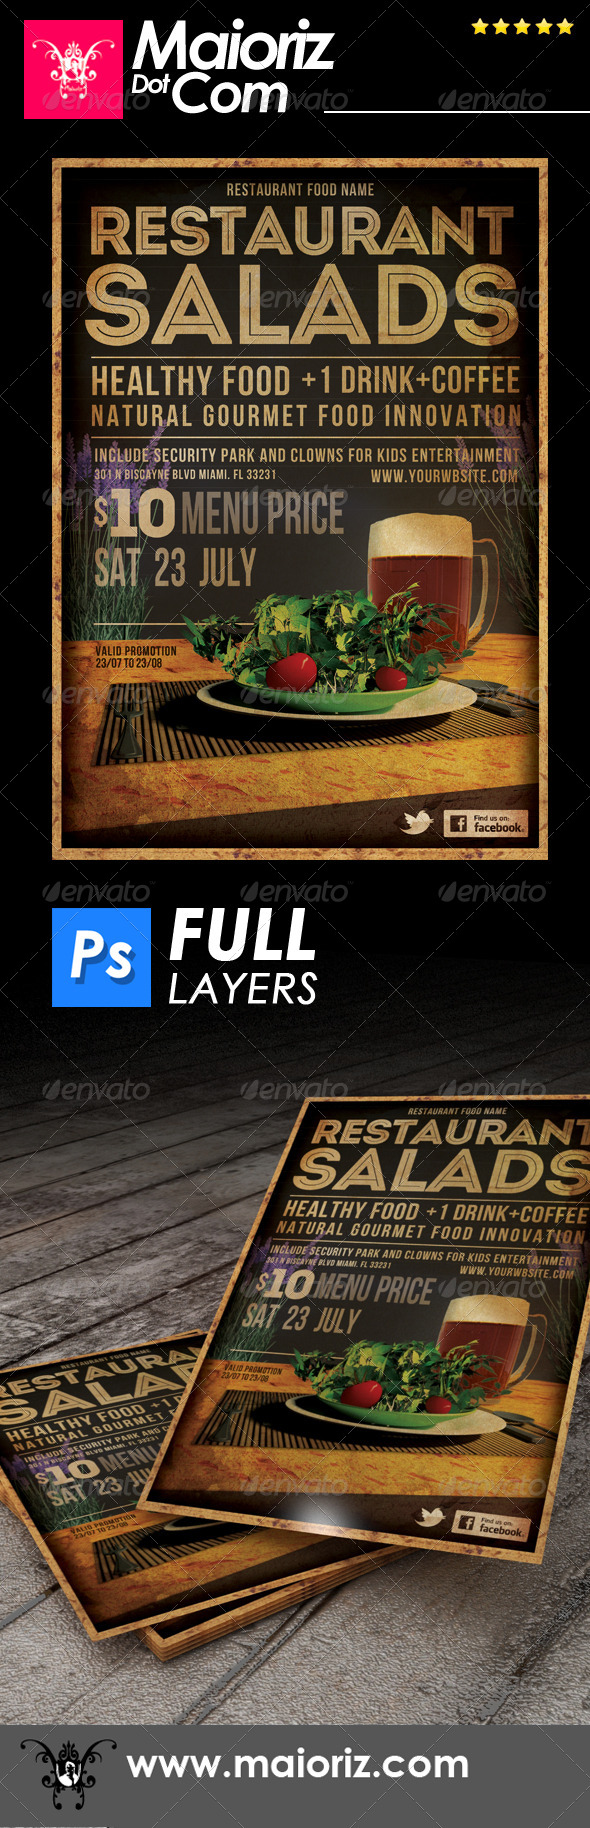 GraphicRiver Restaurant Salads Flyer 6878627